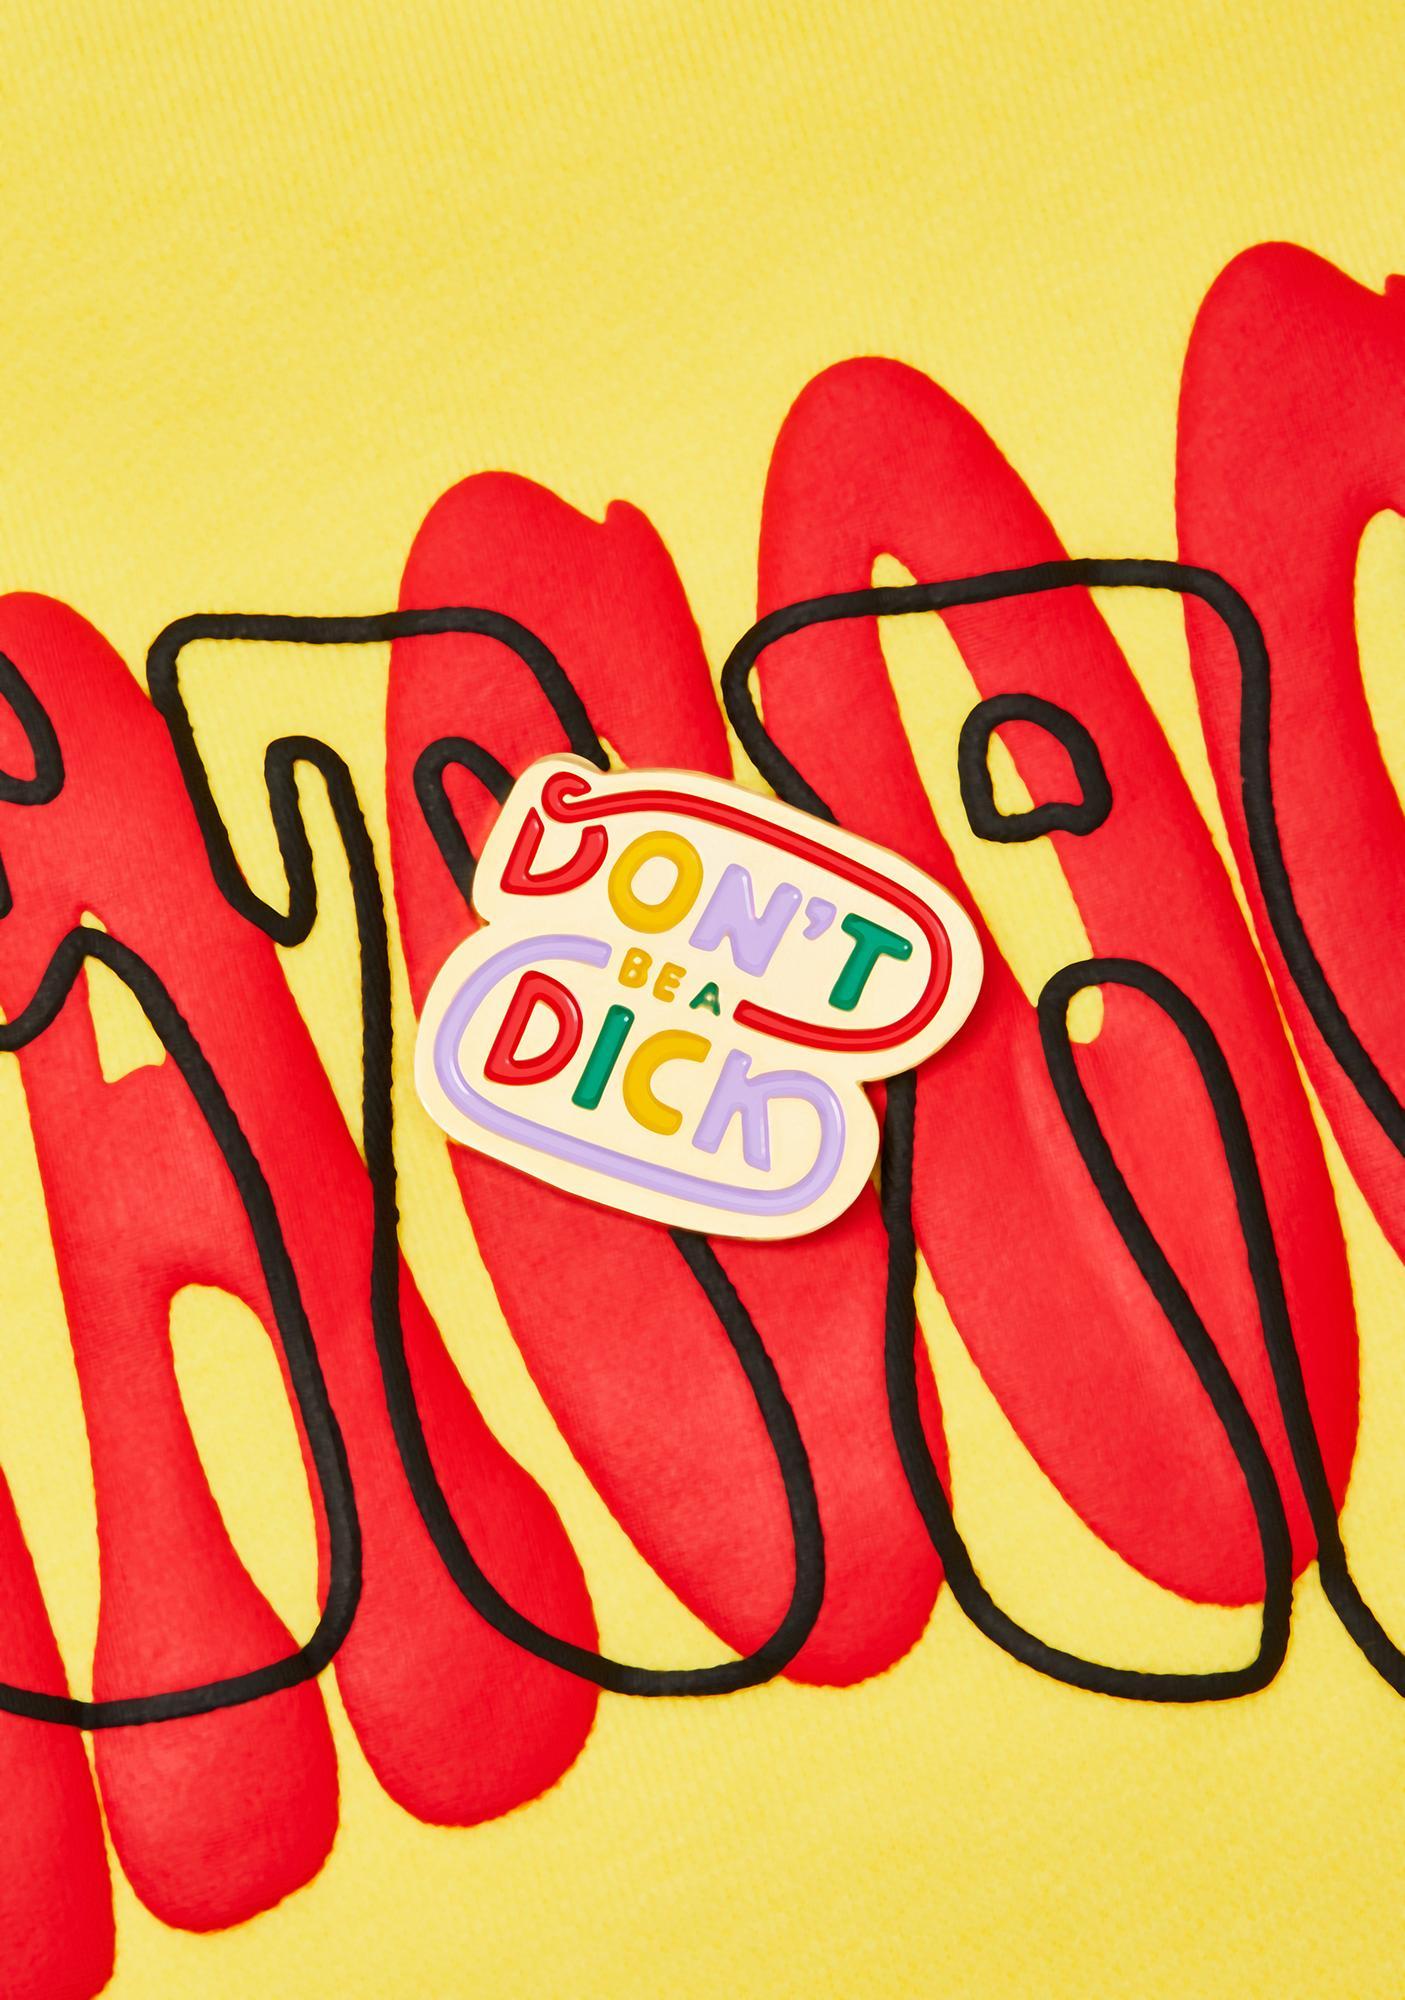 Femfetti Don't Be A Dick Enamel Pin